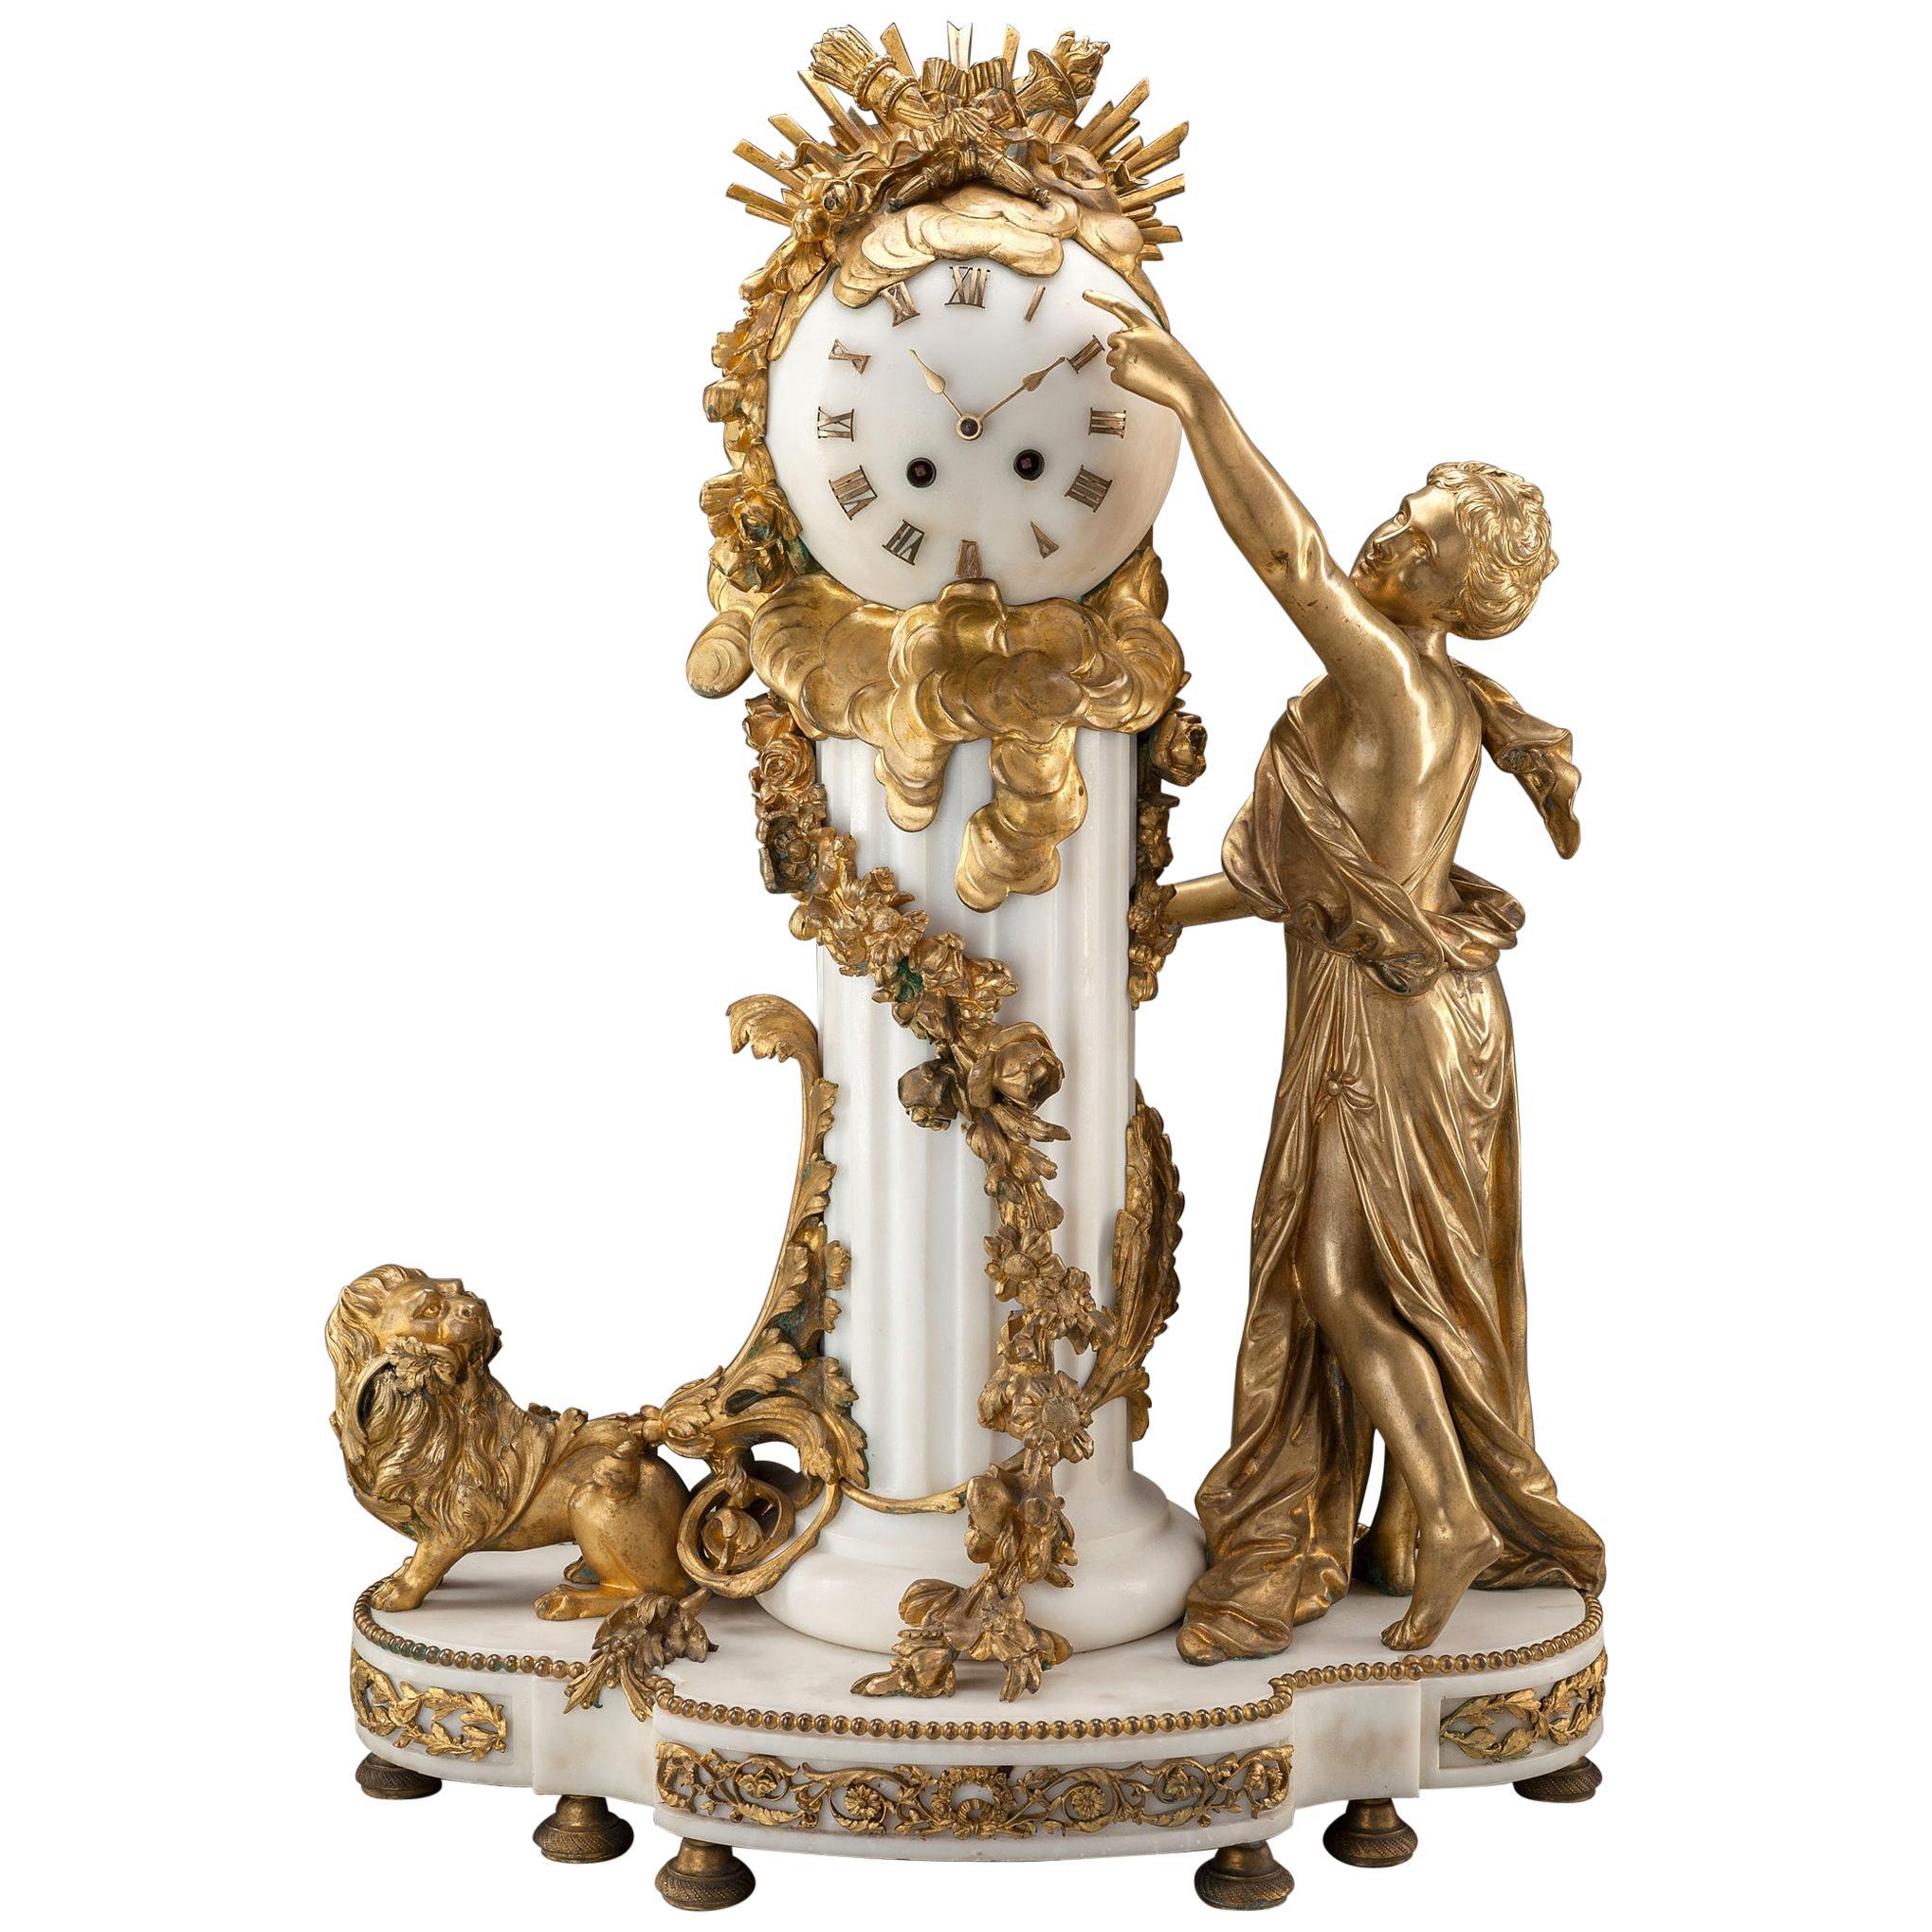 Louis XVI-Style Gilt Bronze and White Marble Figural Mantel Clock